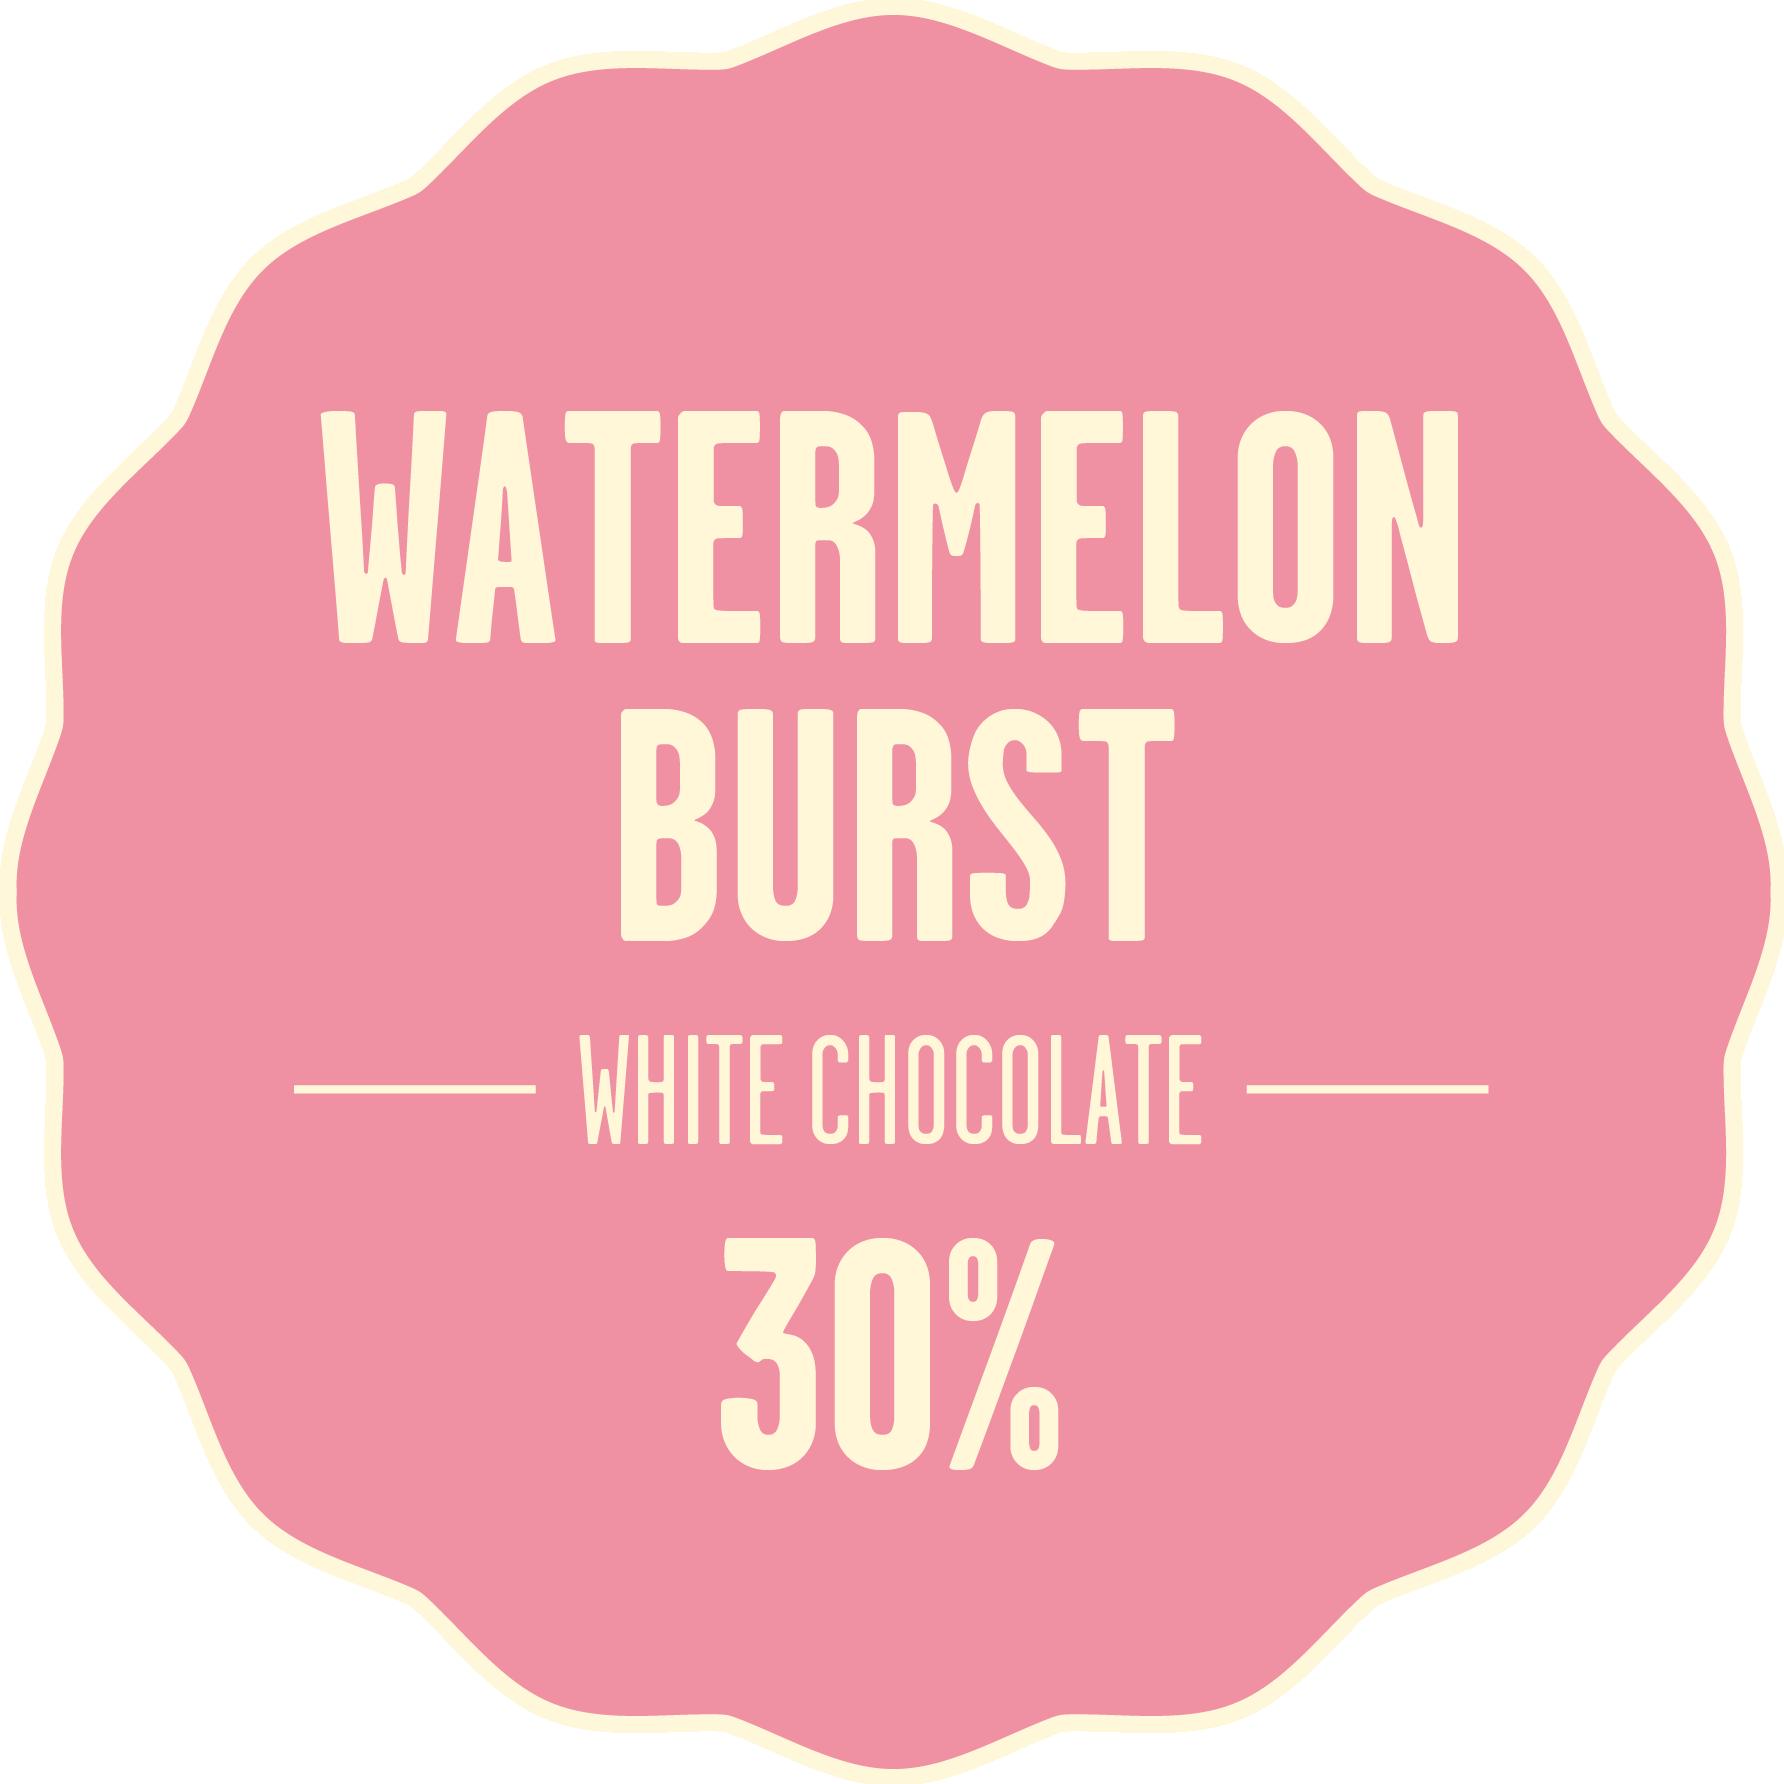 White chocolate bonbon melon 428px